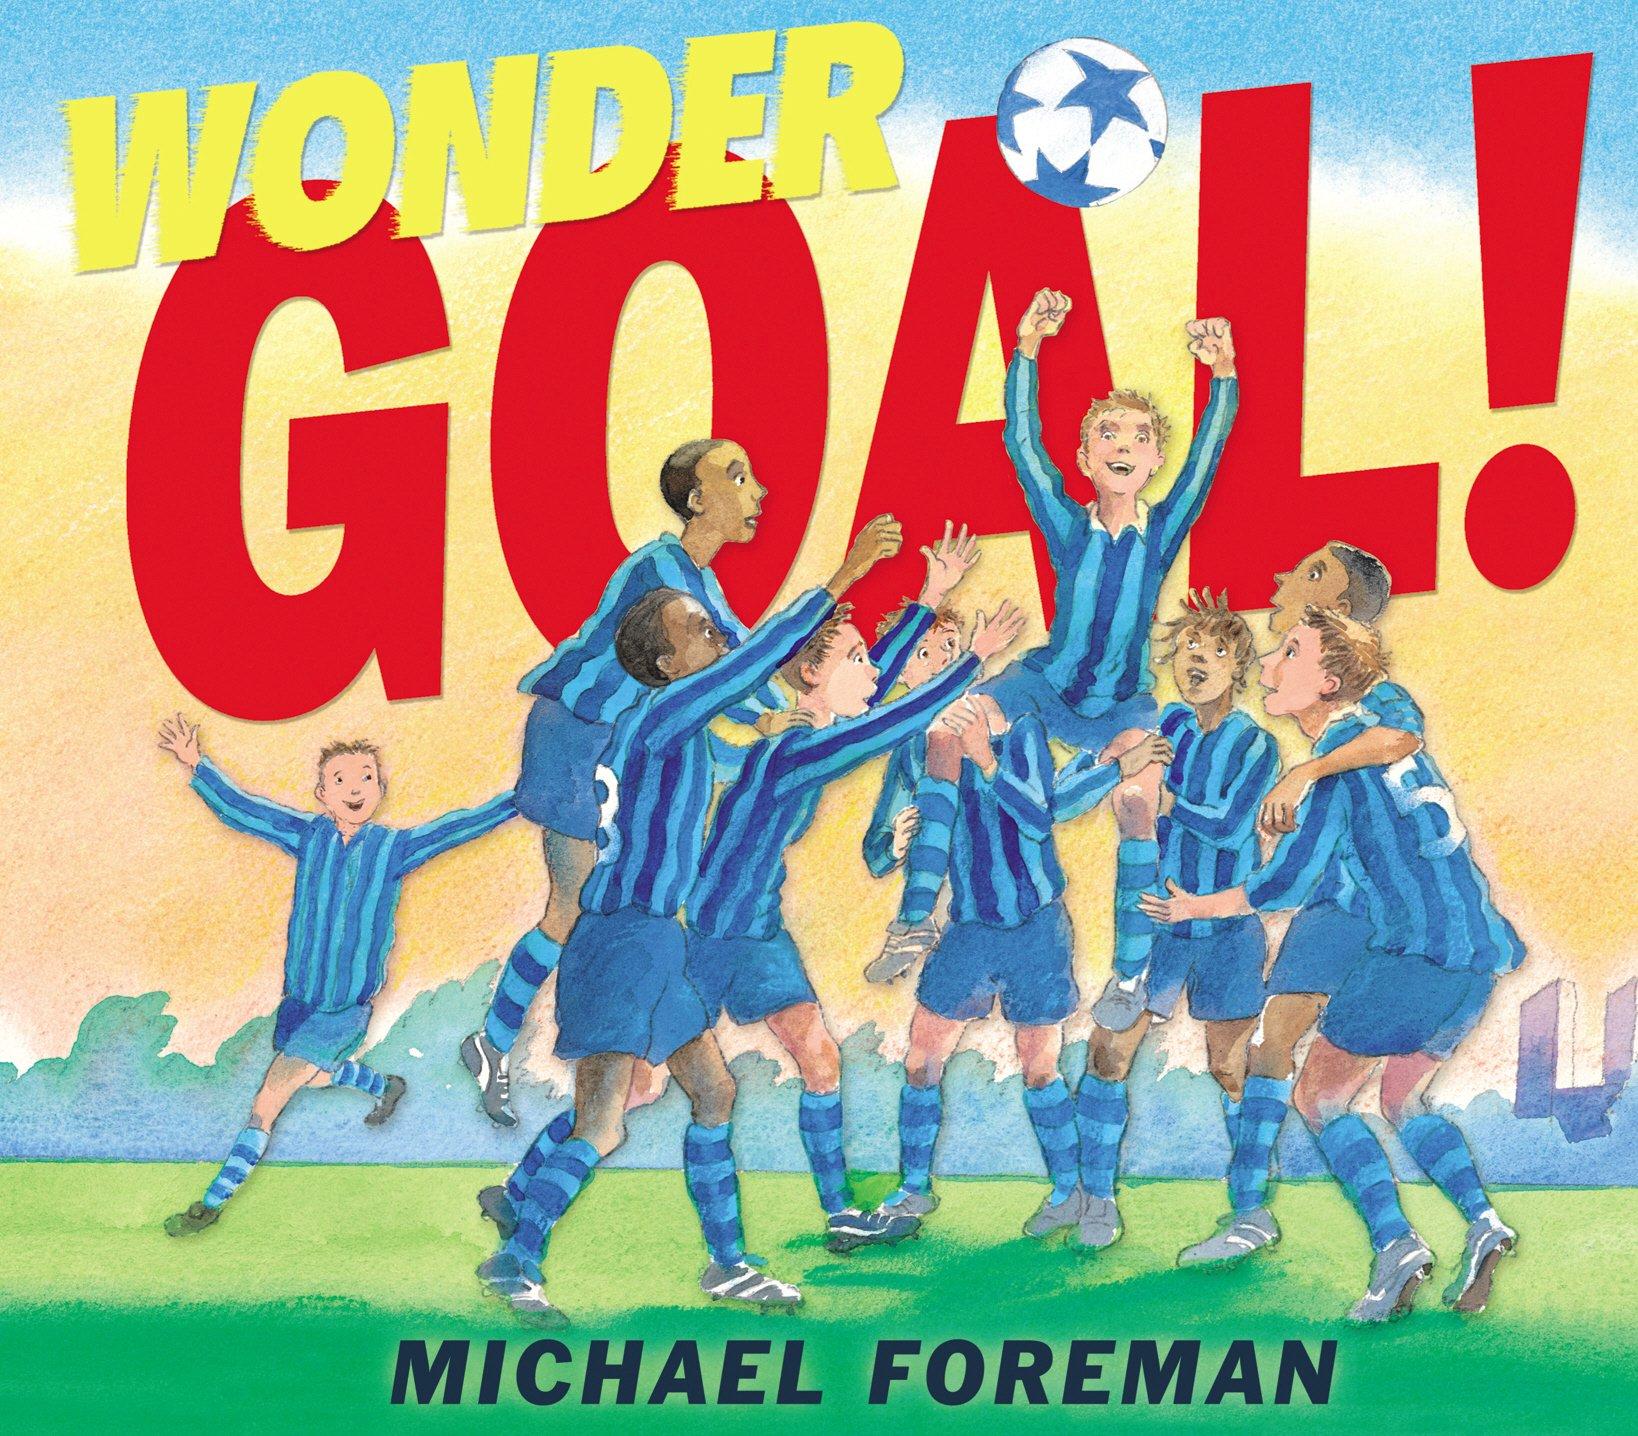 Wonder Goal!: Amazon.co.uk: Foreman, Michael: Books